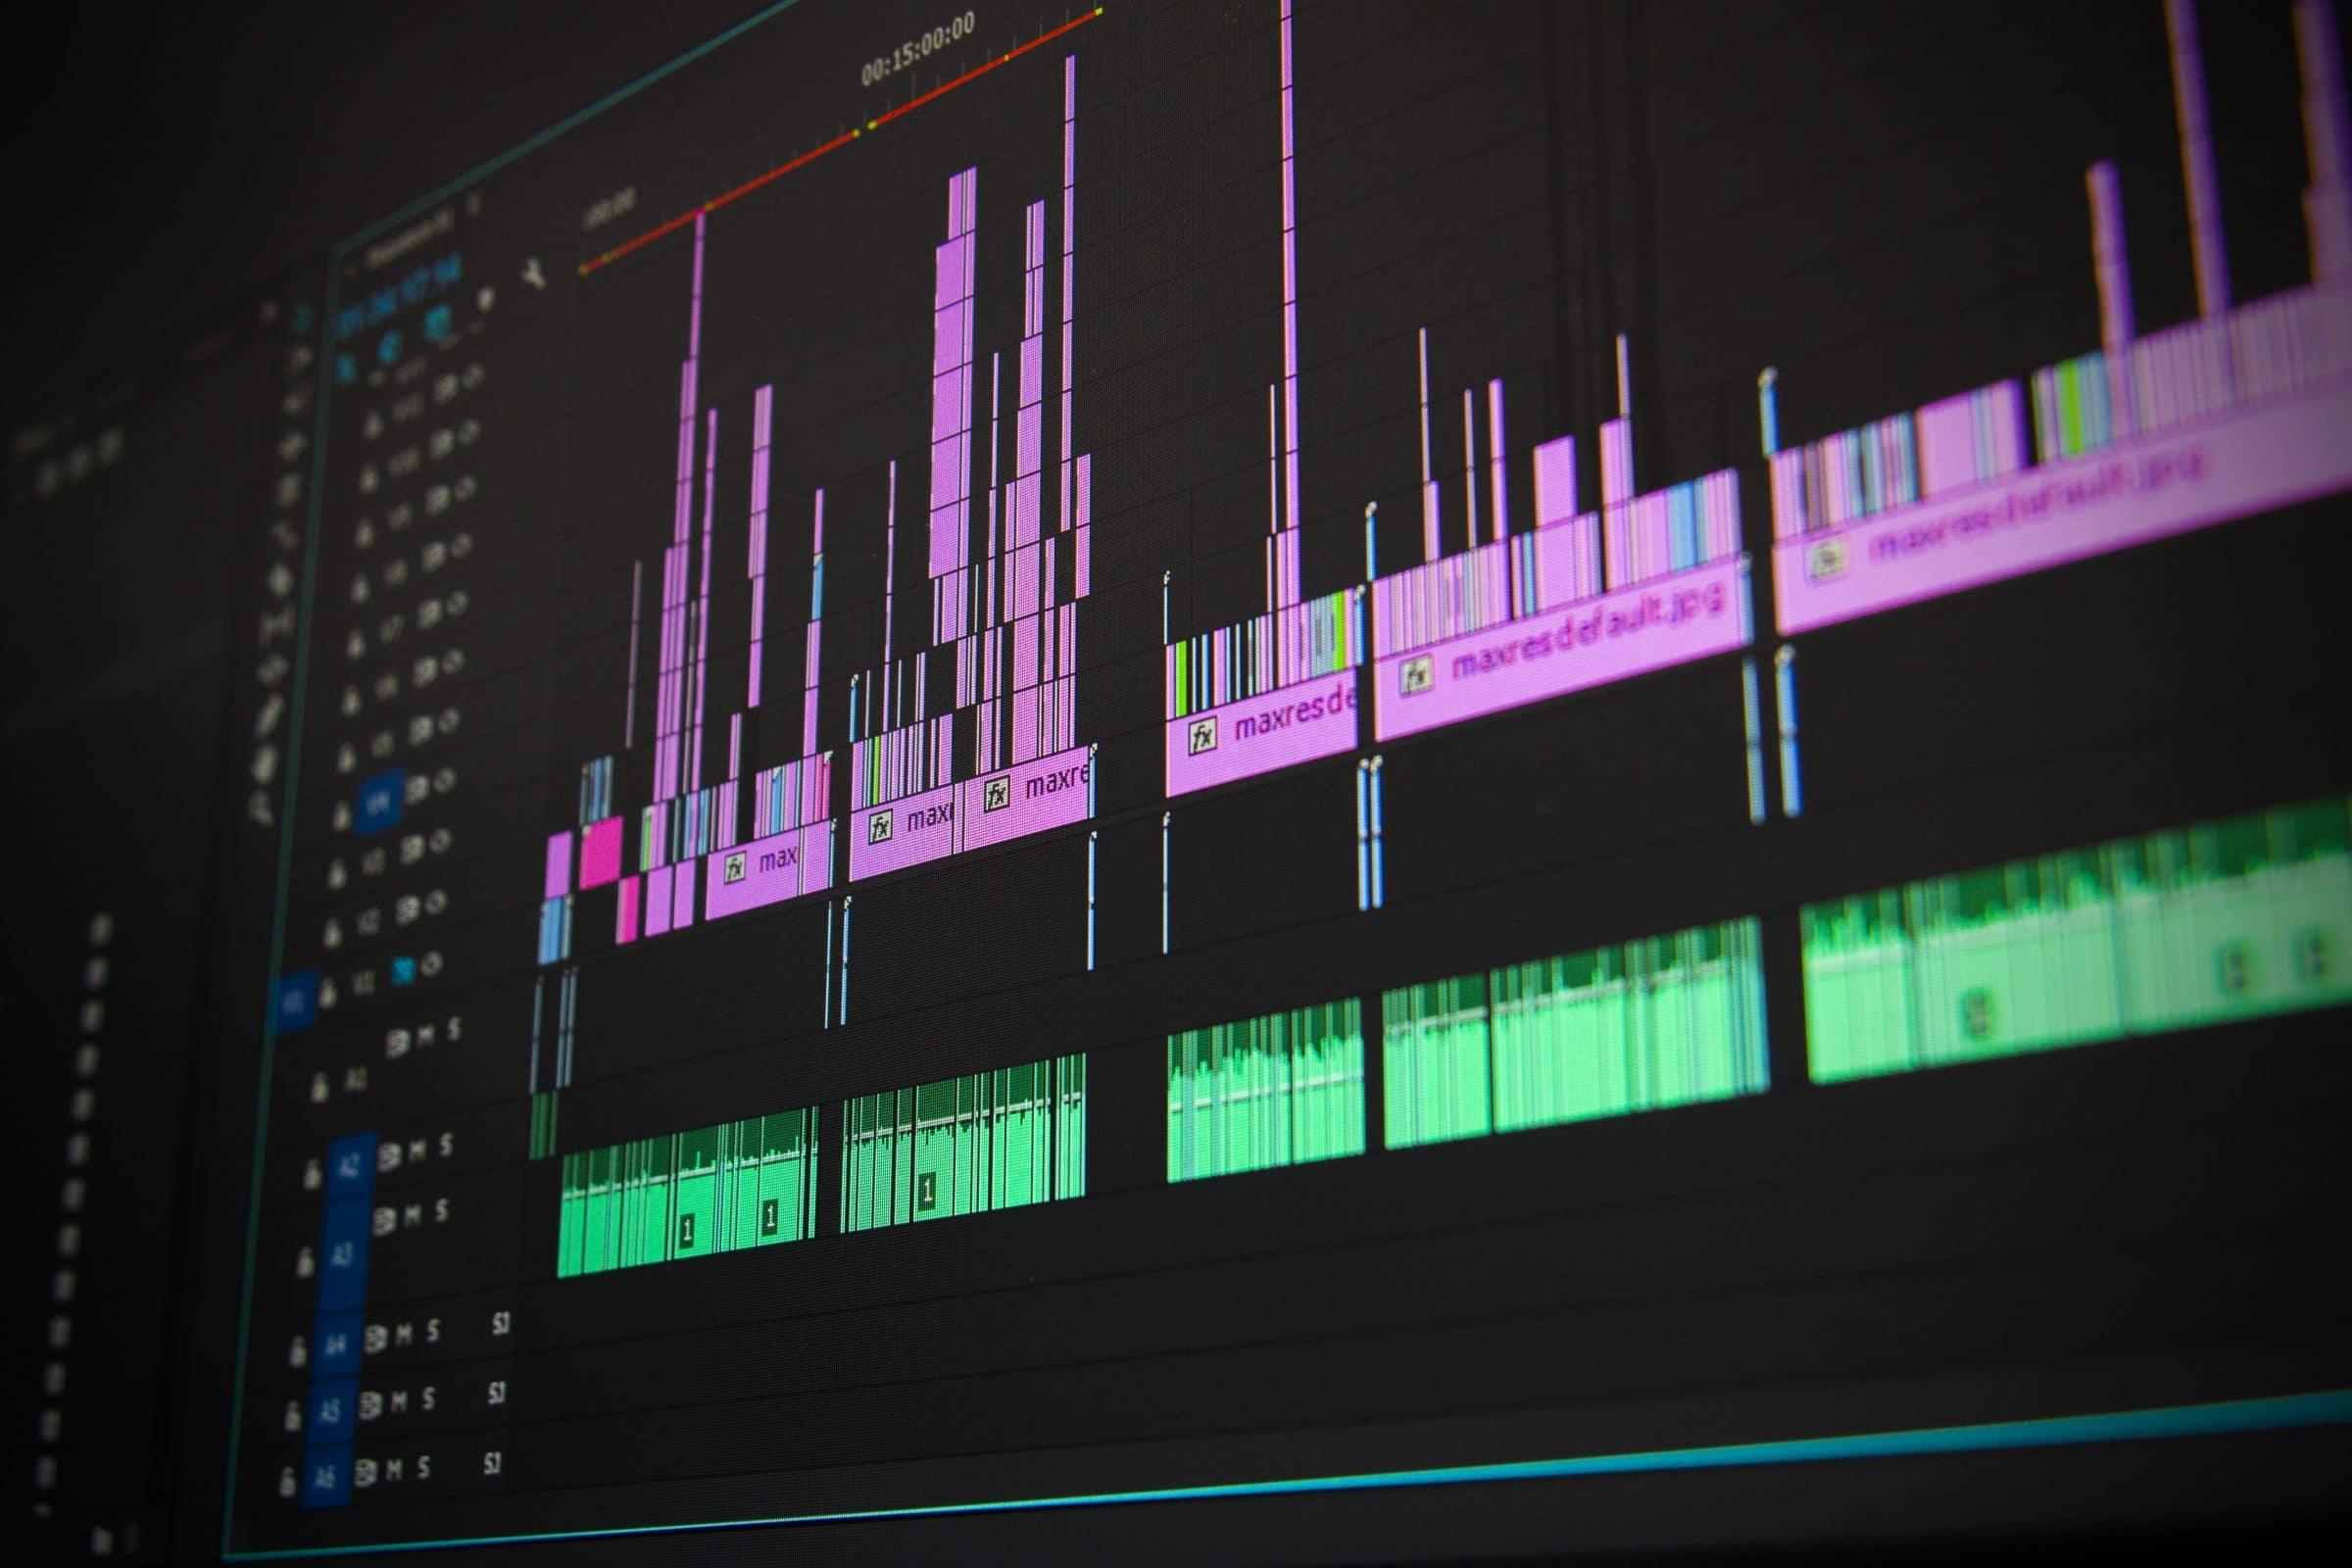 Editing in Premiere Pro